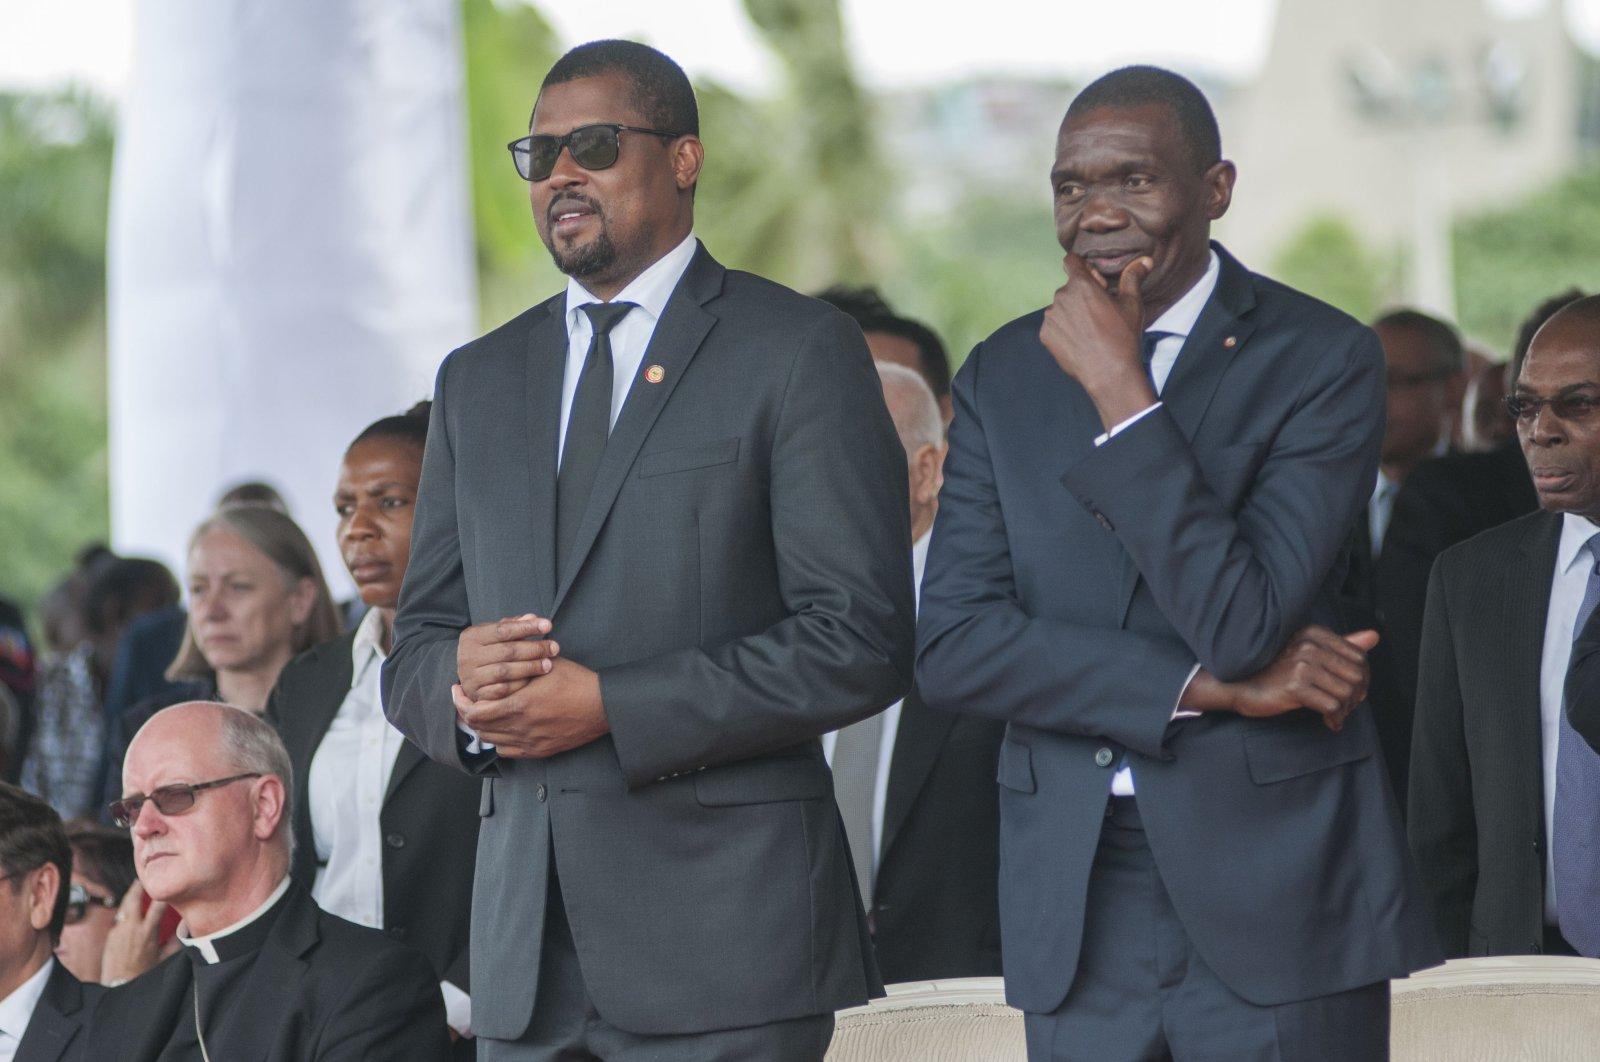 Joseph Lambert (R) seen here in 2018 attending a ceremony to remember the earthquake of 2010, Port-au-Prince, Haiti, Jan. 12, 2018. (EPA-EFE/JEAN MARC HERVE ABELARD)